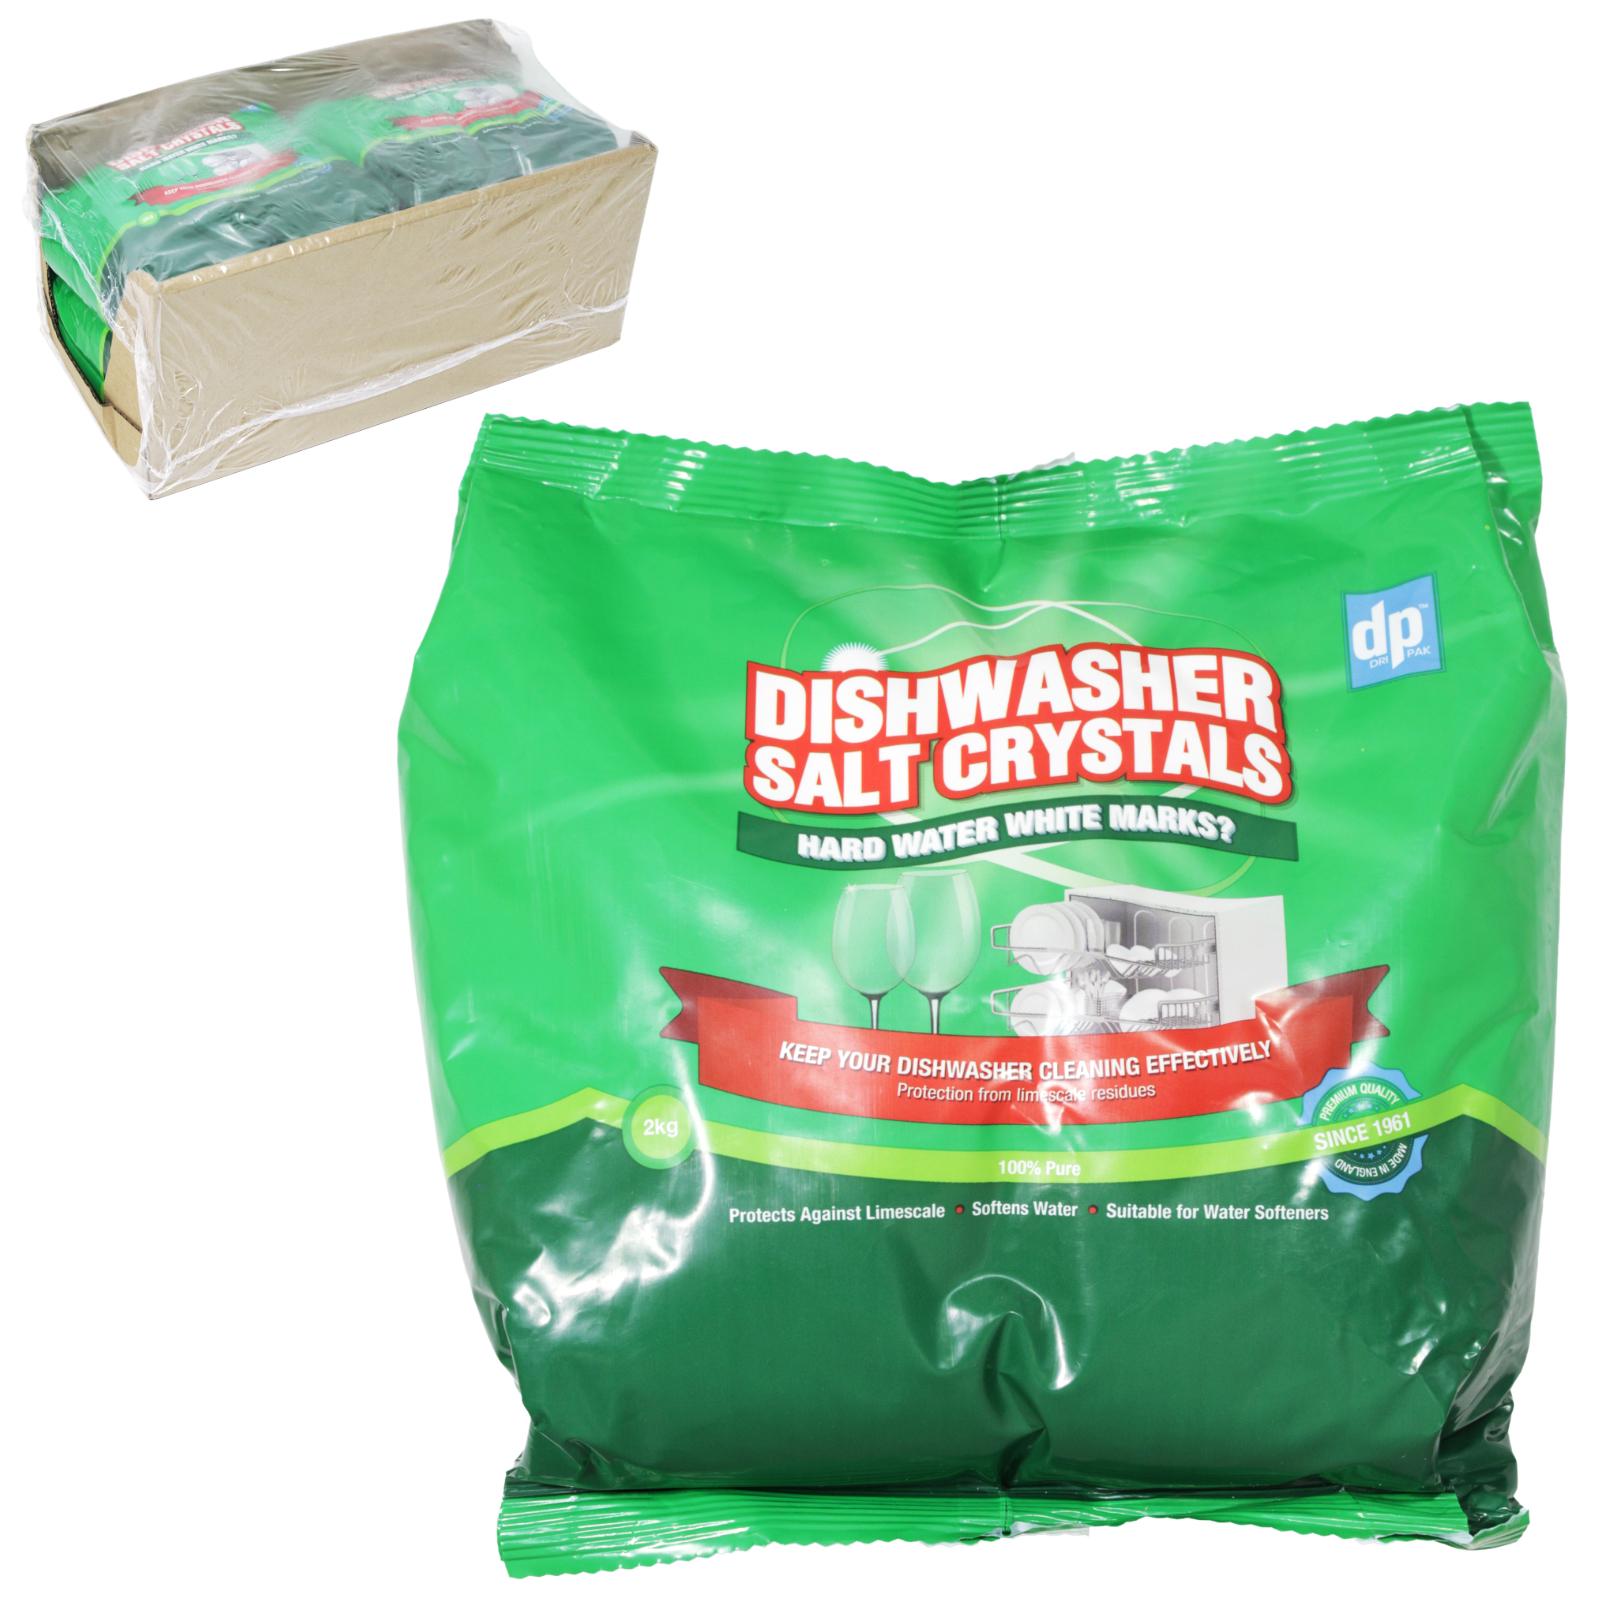 OPAL DISHWASHER SALT 2 KILO BAG X6